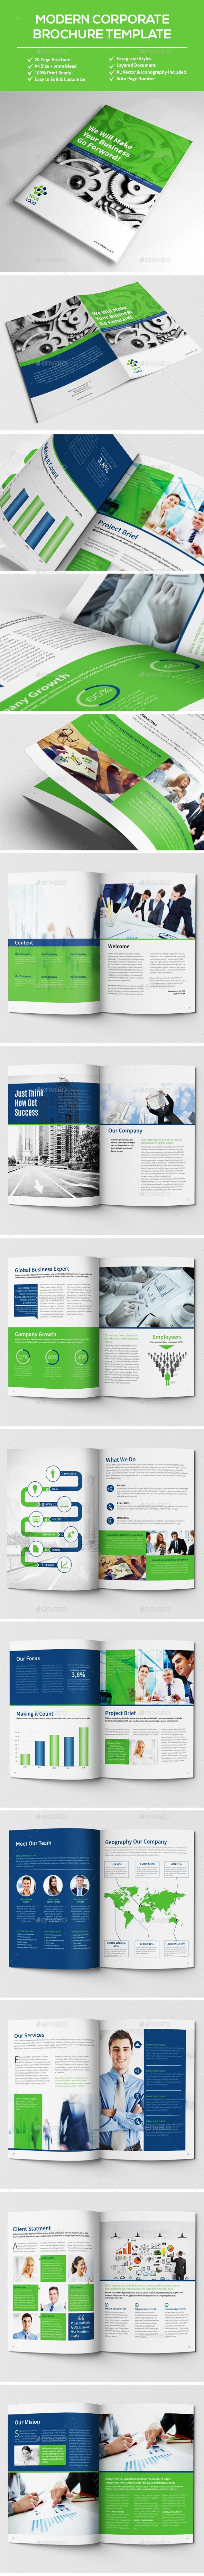 GraphicRiver Multypurpose Corporate Brochure 11969528